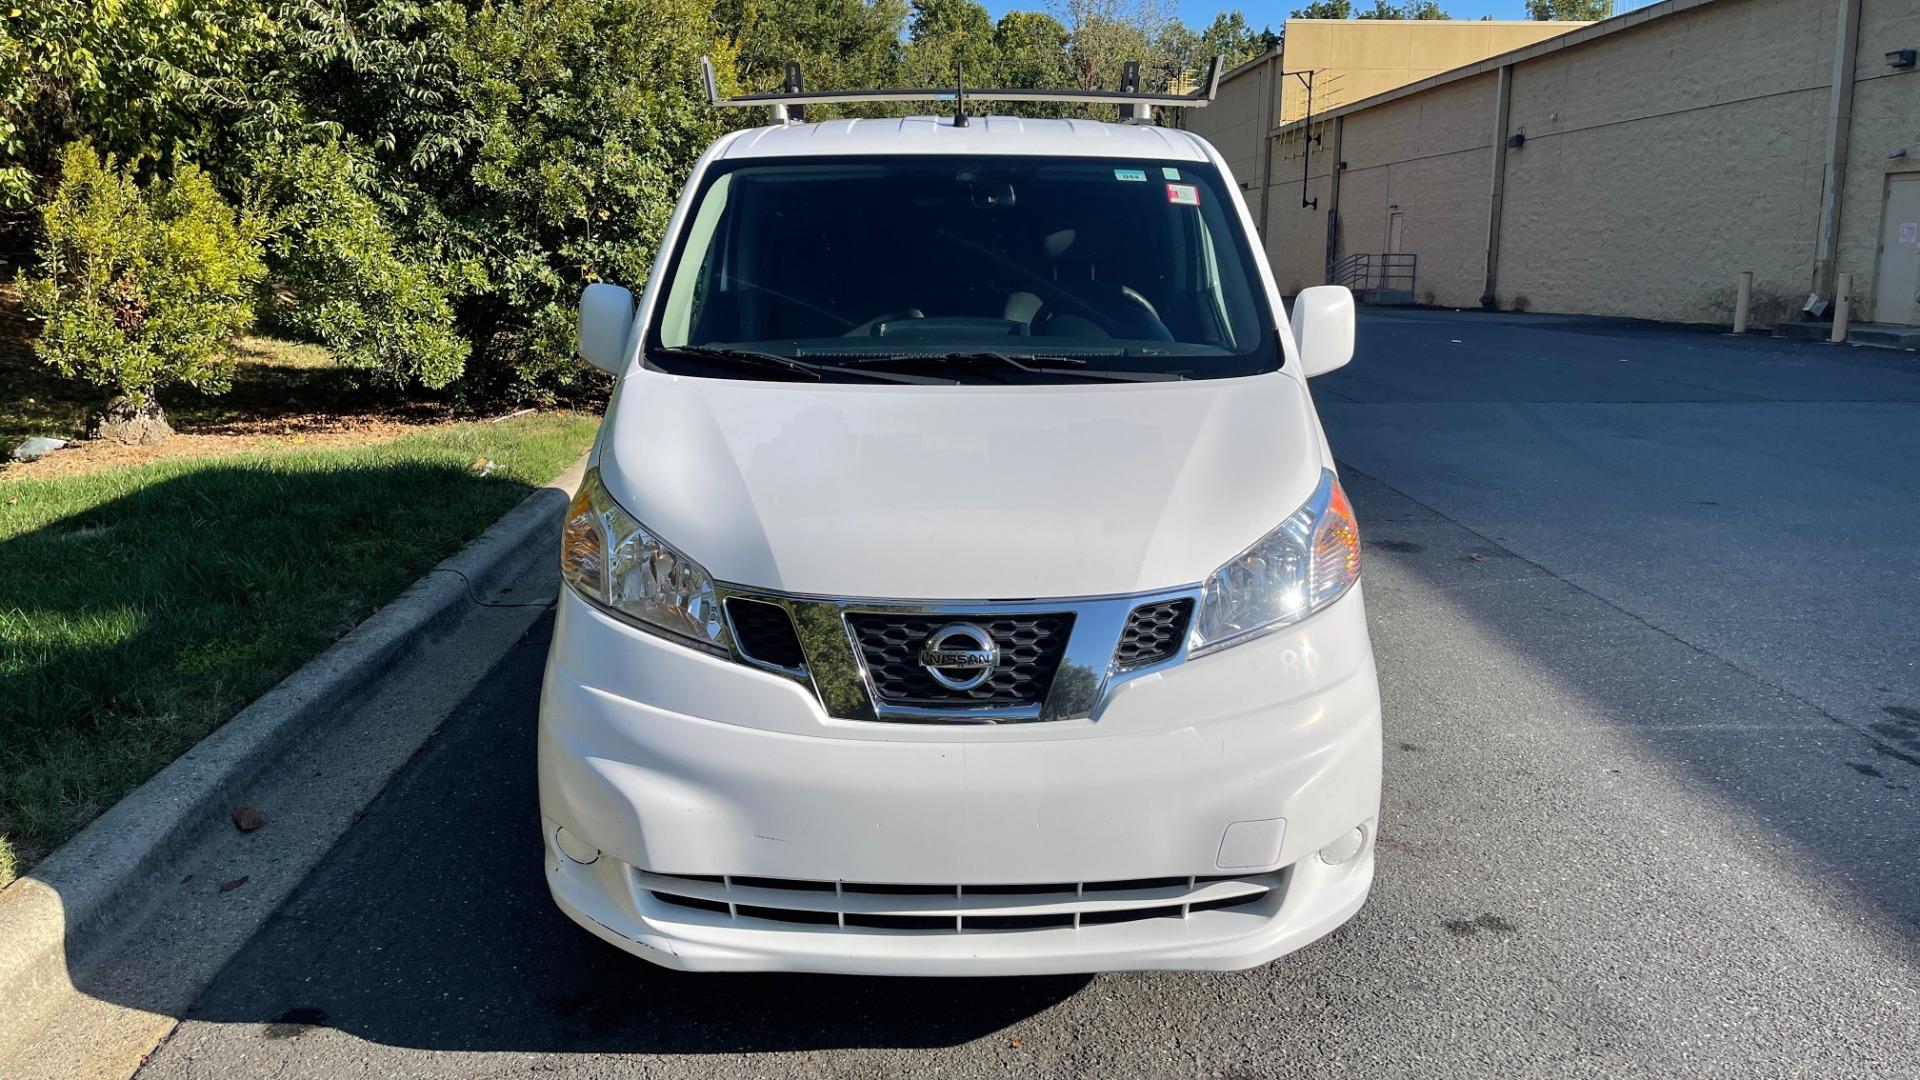 Used 2015 Nissan NV200 SV / WORK VAN / EXTERIOR APPEARANCE PKG / ROOF RACK for sale $16,999 at Formula Imports in Charlotte NC 28227 11